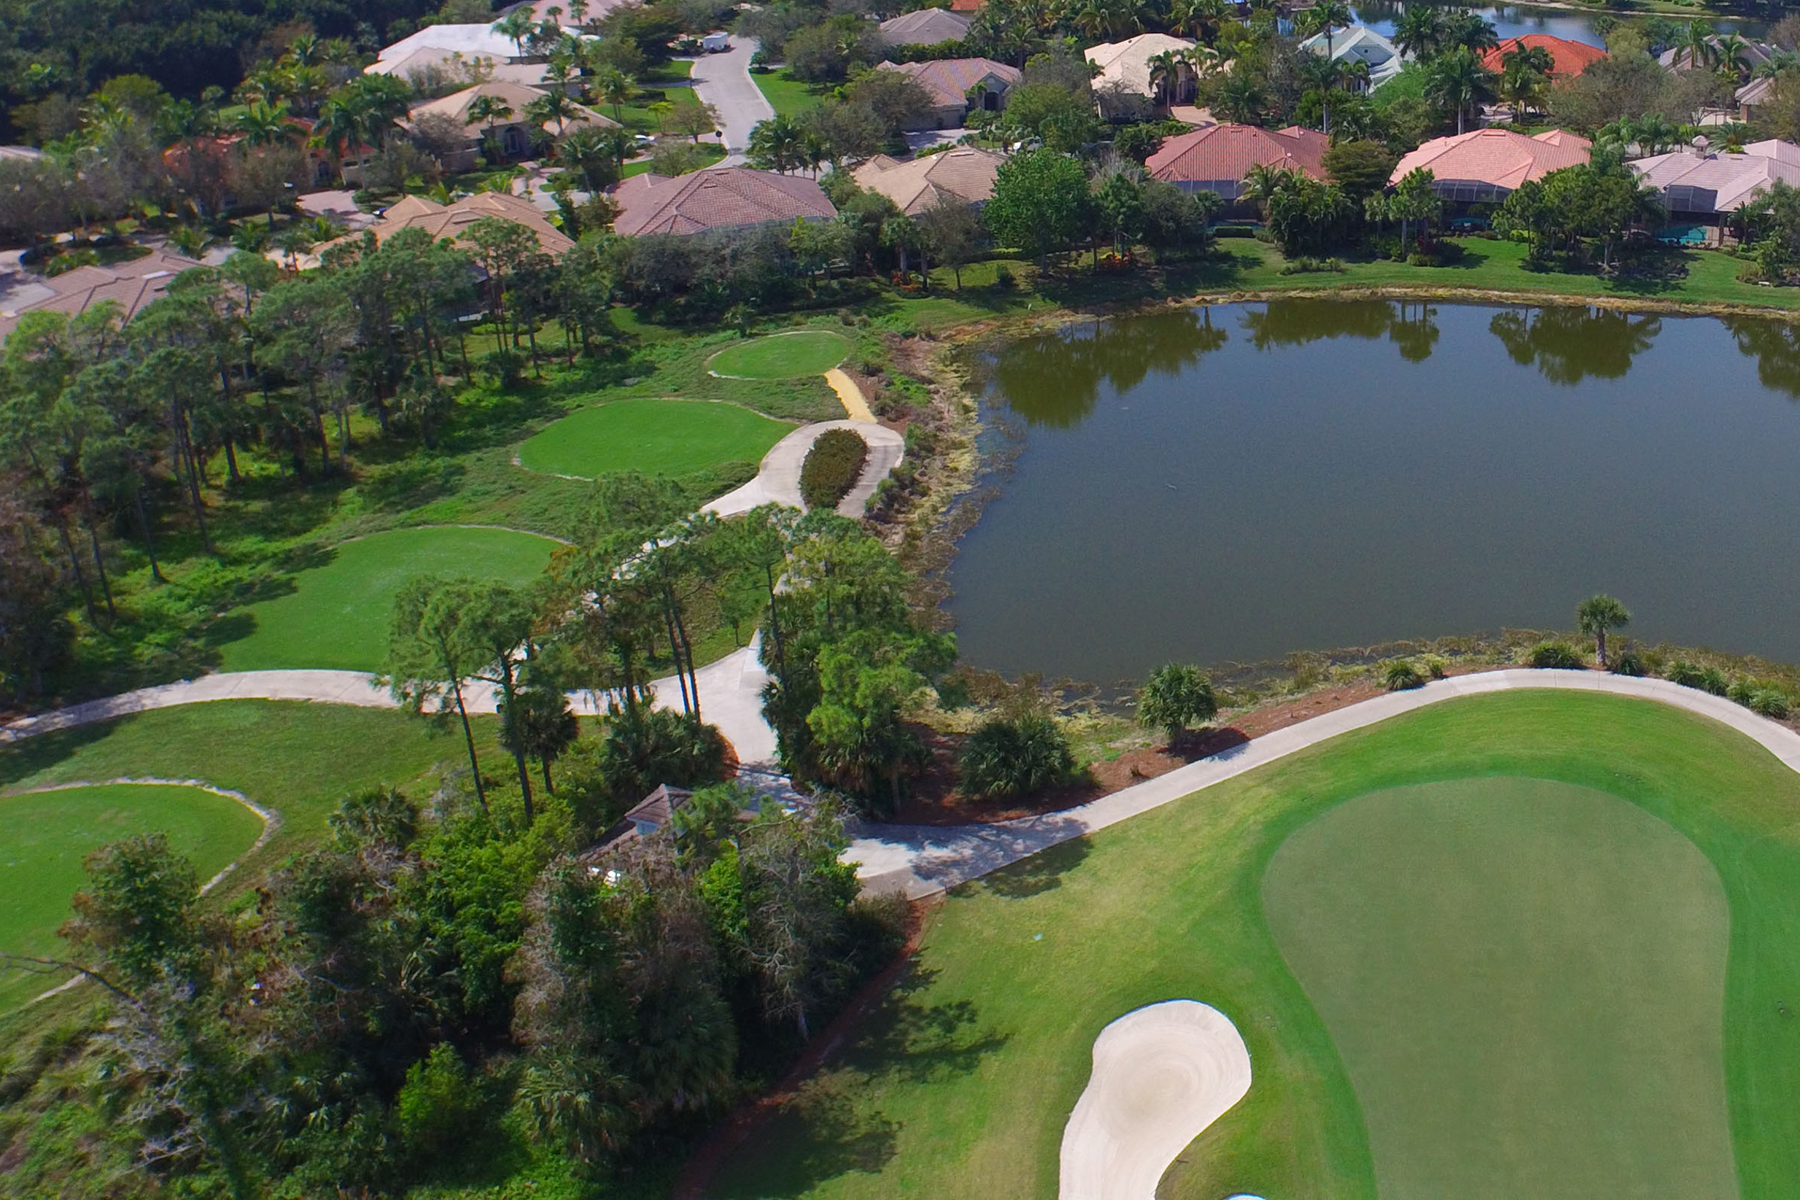 Casa Unifamiliar por un Venta en FIDDLER'S CREEK - MULBERRY 7646 Mulberry Ln Naples, Florida 34114 Estados Unidos